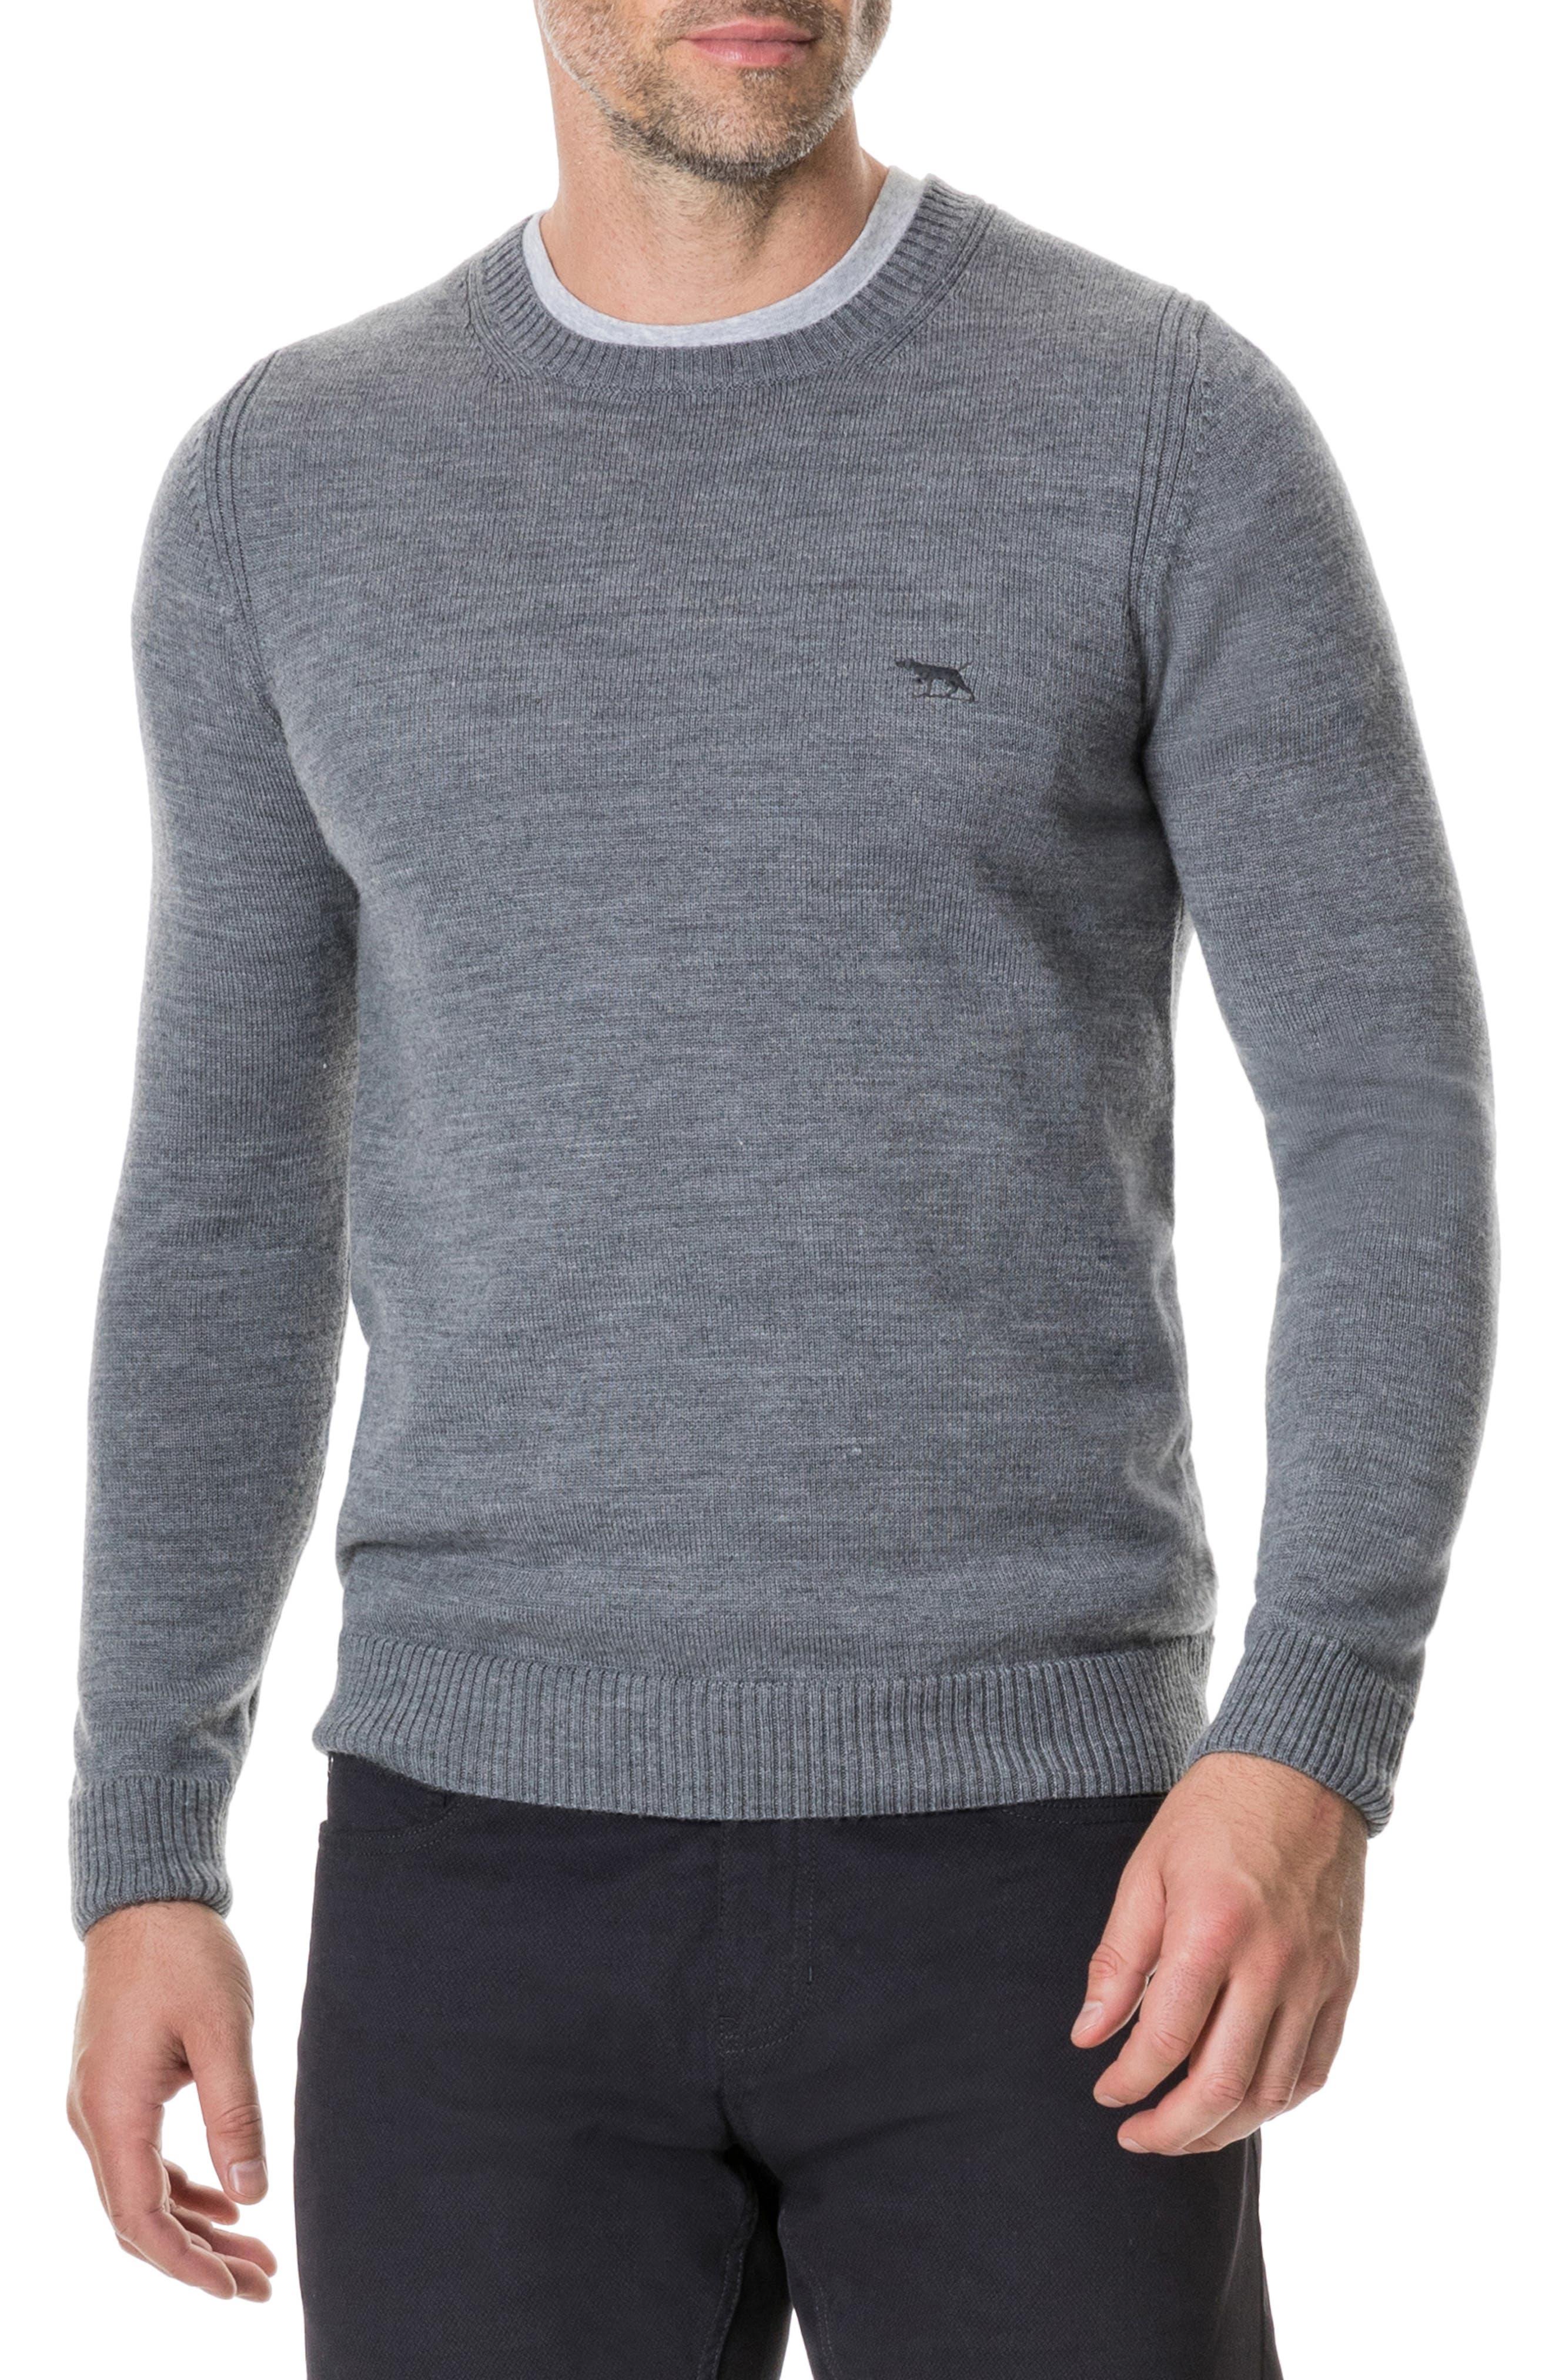 Gala Street Sweater,                             Main thumbnail 1, color,                             SMOKE